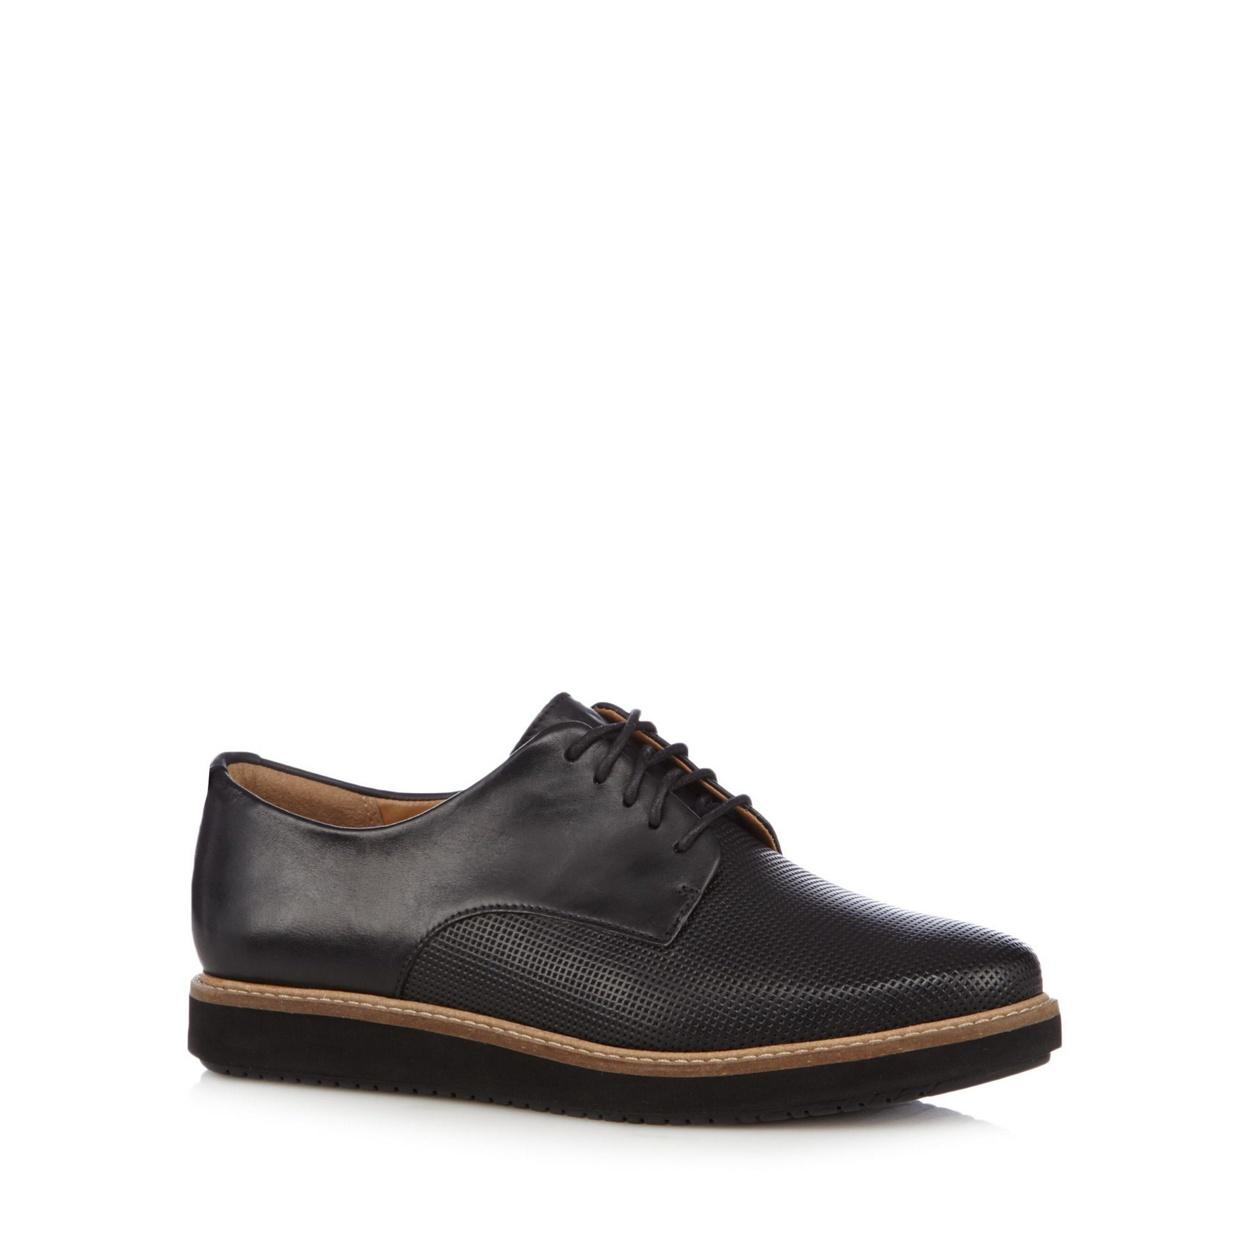 Black sandals debenhams - Clarks Black Leather Glick Darby Brogues